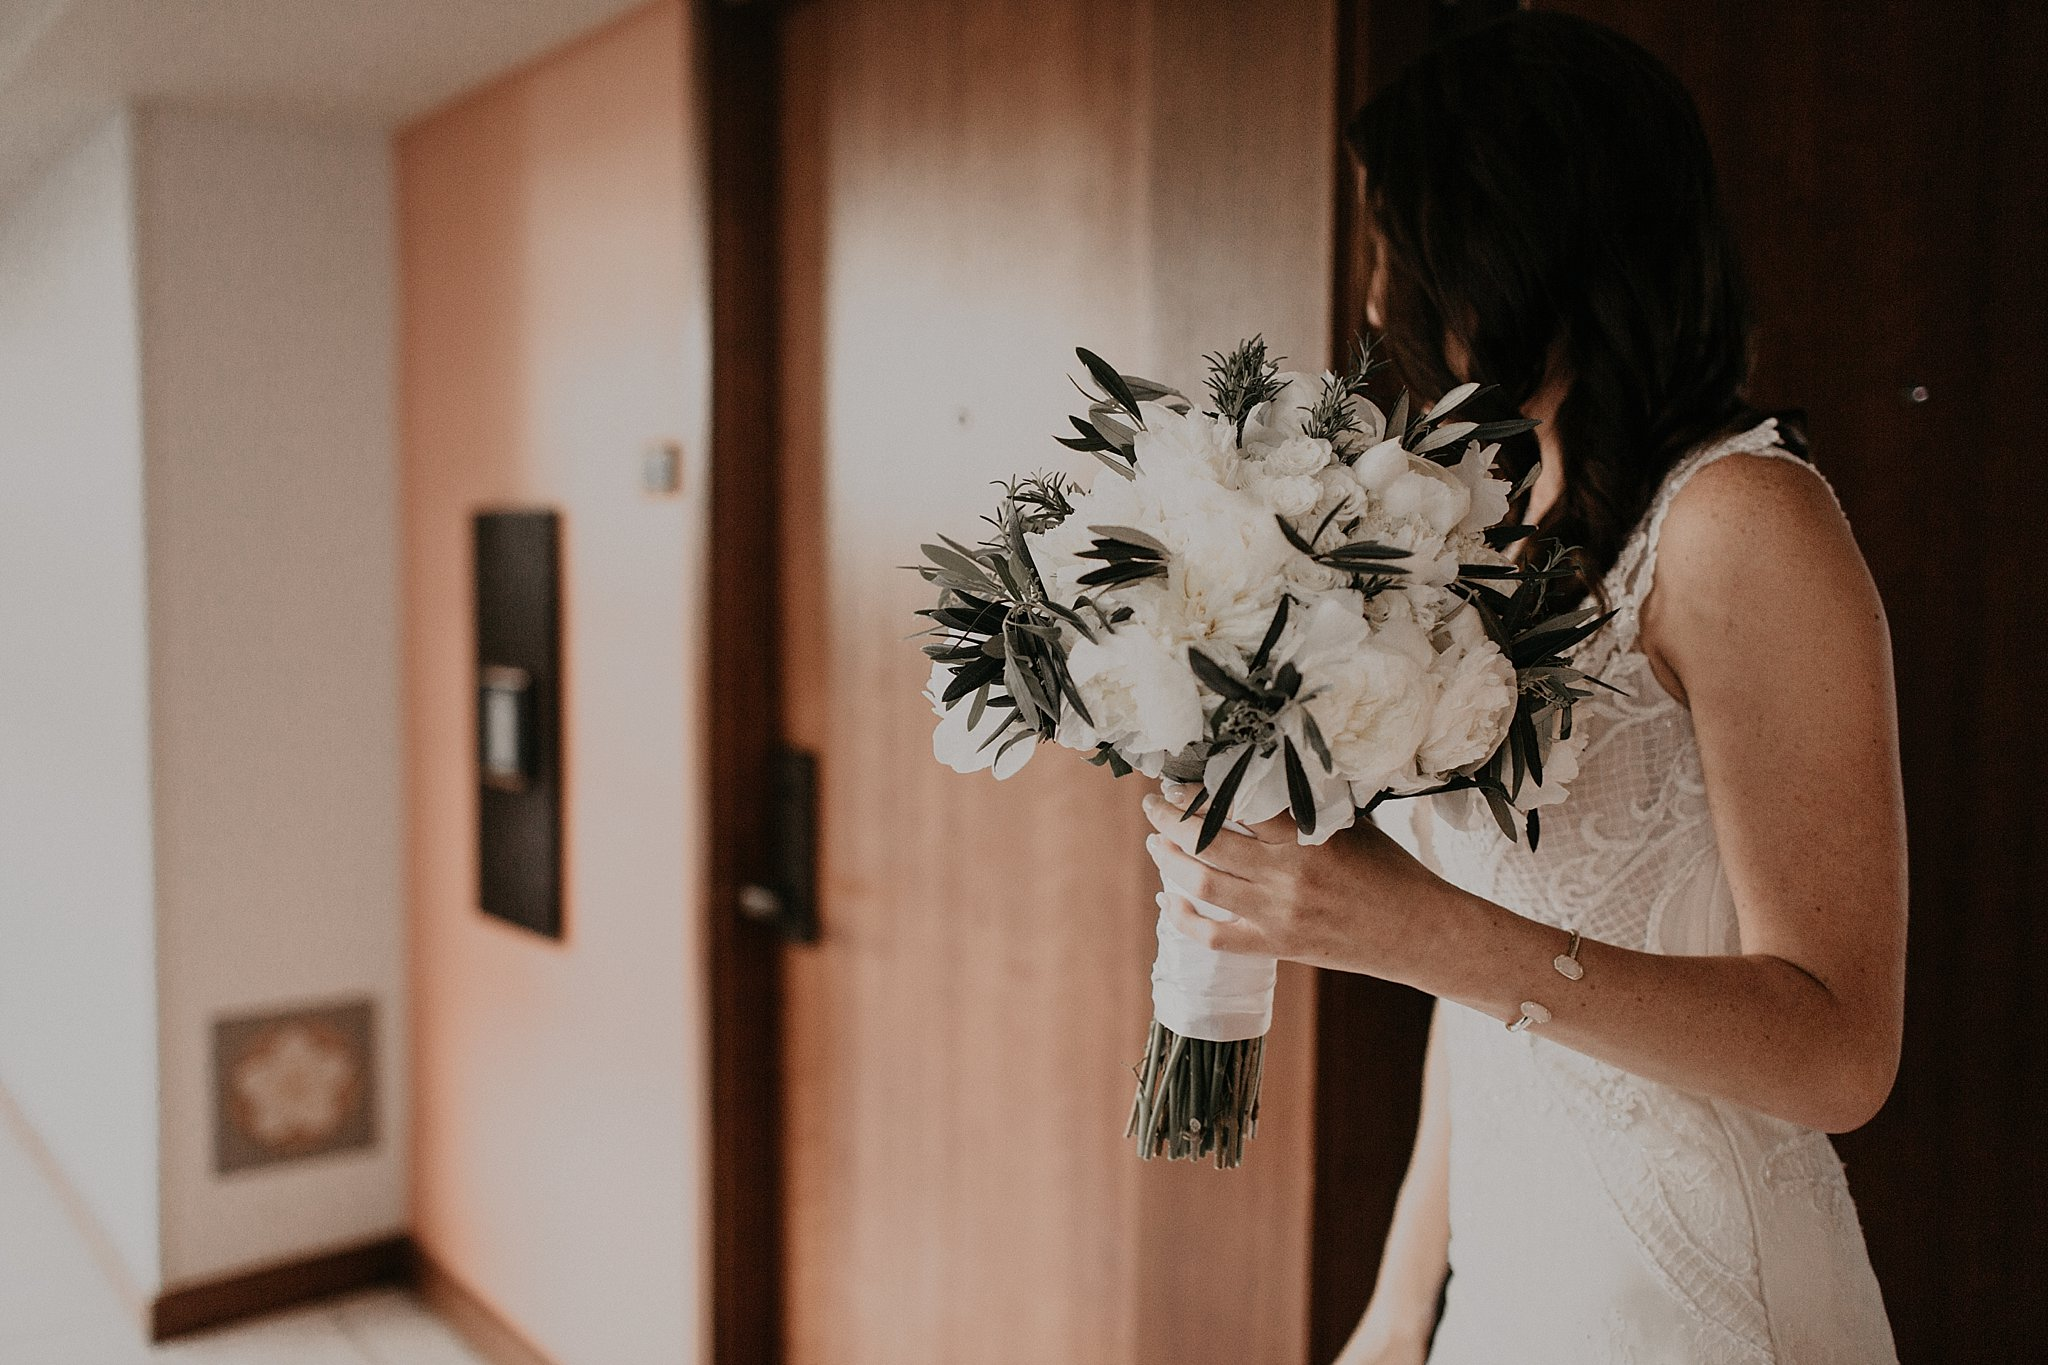 samantha_mcfarlen_bellingham_washington_engagement_photography_seattle_wedding_photographer_0184.jpg